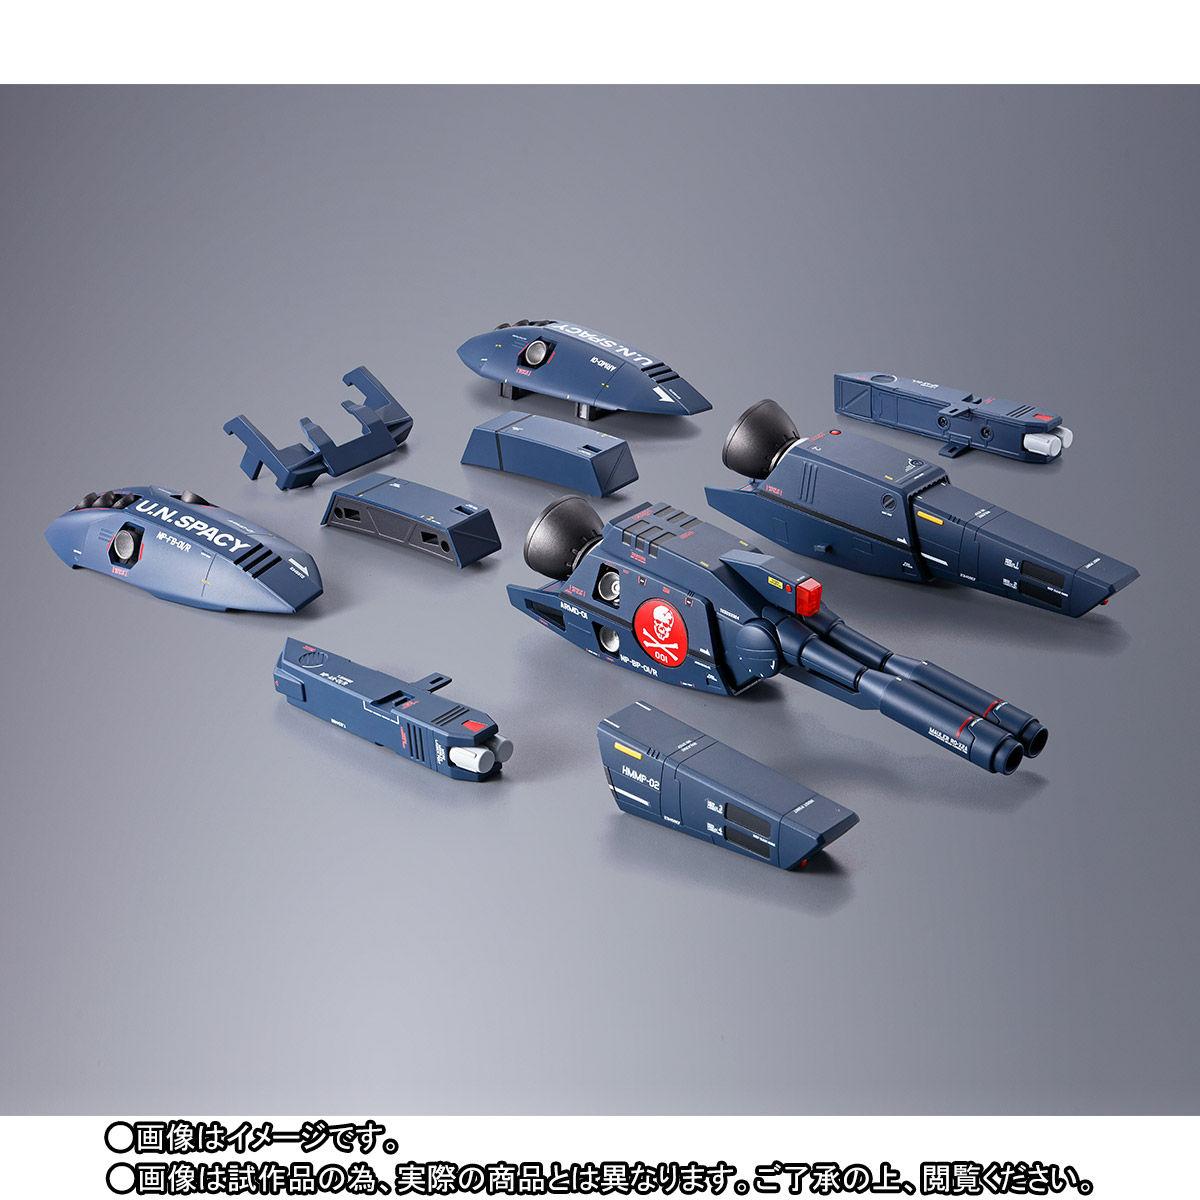 DX超合金『劇場版VF-1対応ストライク/スーパーパーツセット』拡張パーツ-002